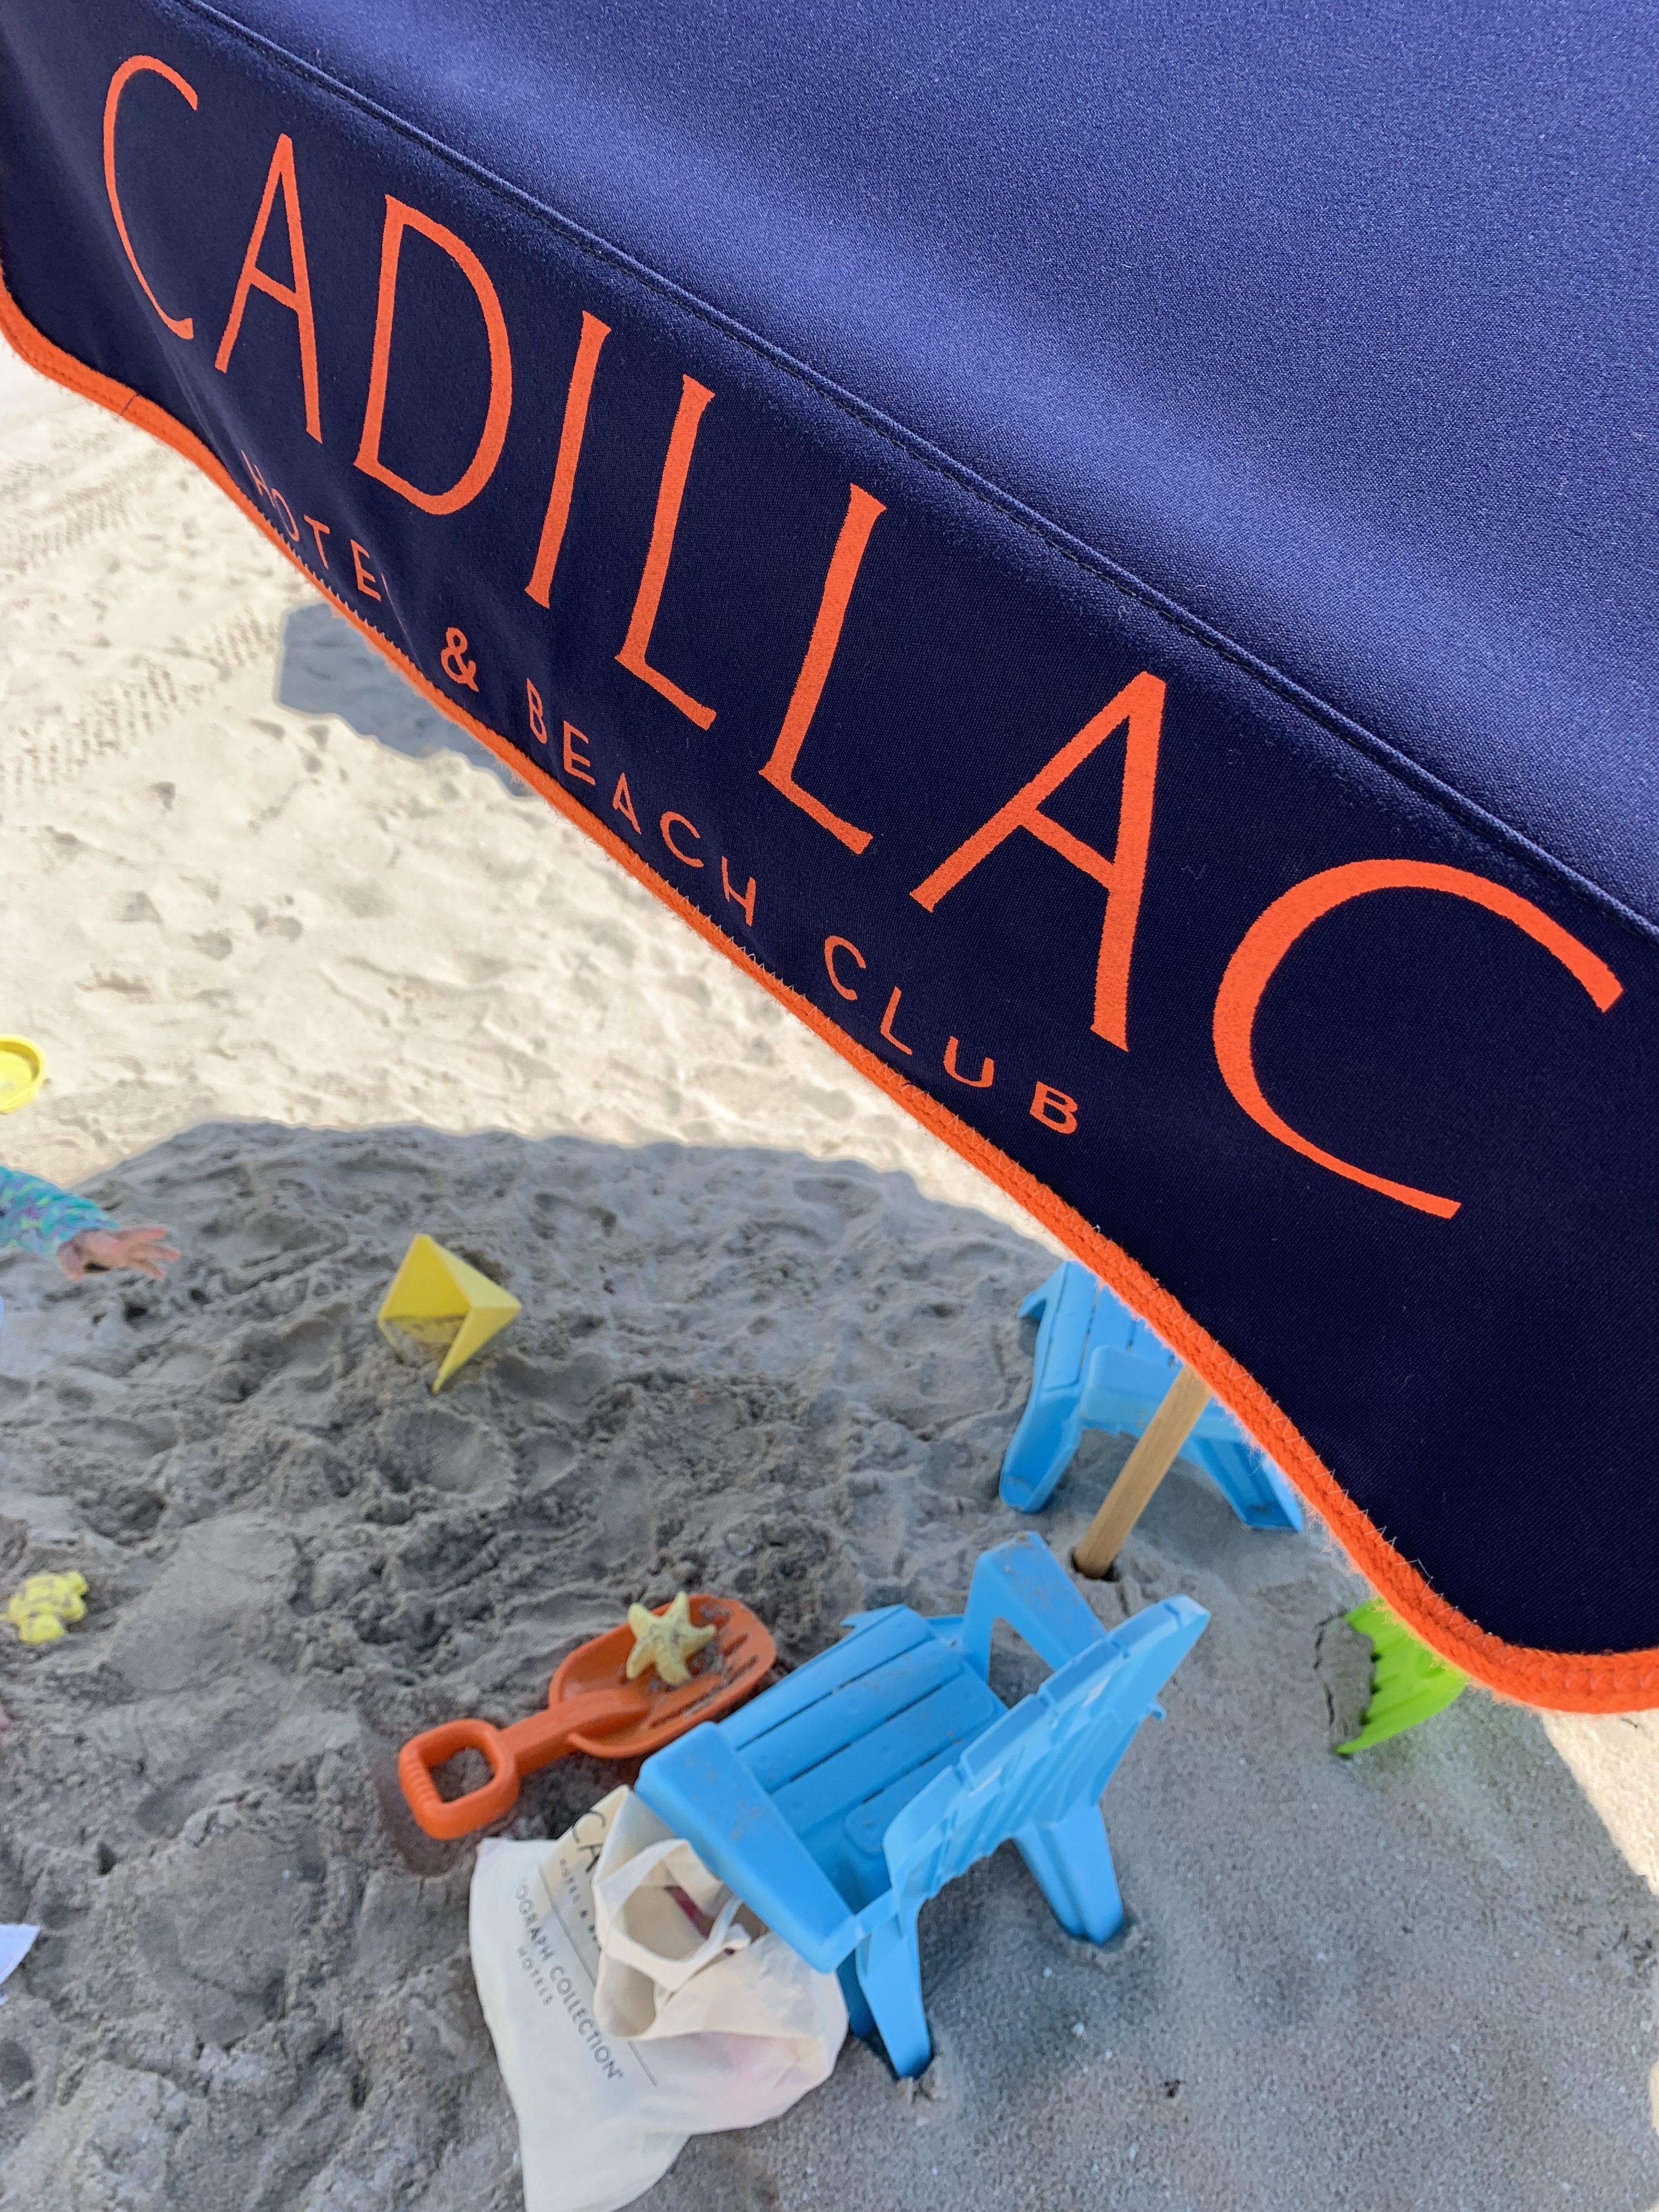 cadillac hotel & beach resort family friendly Miami Beach